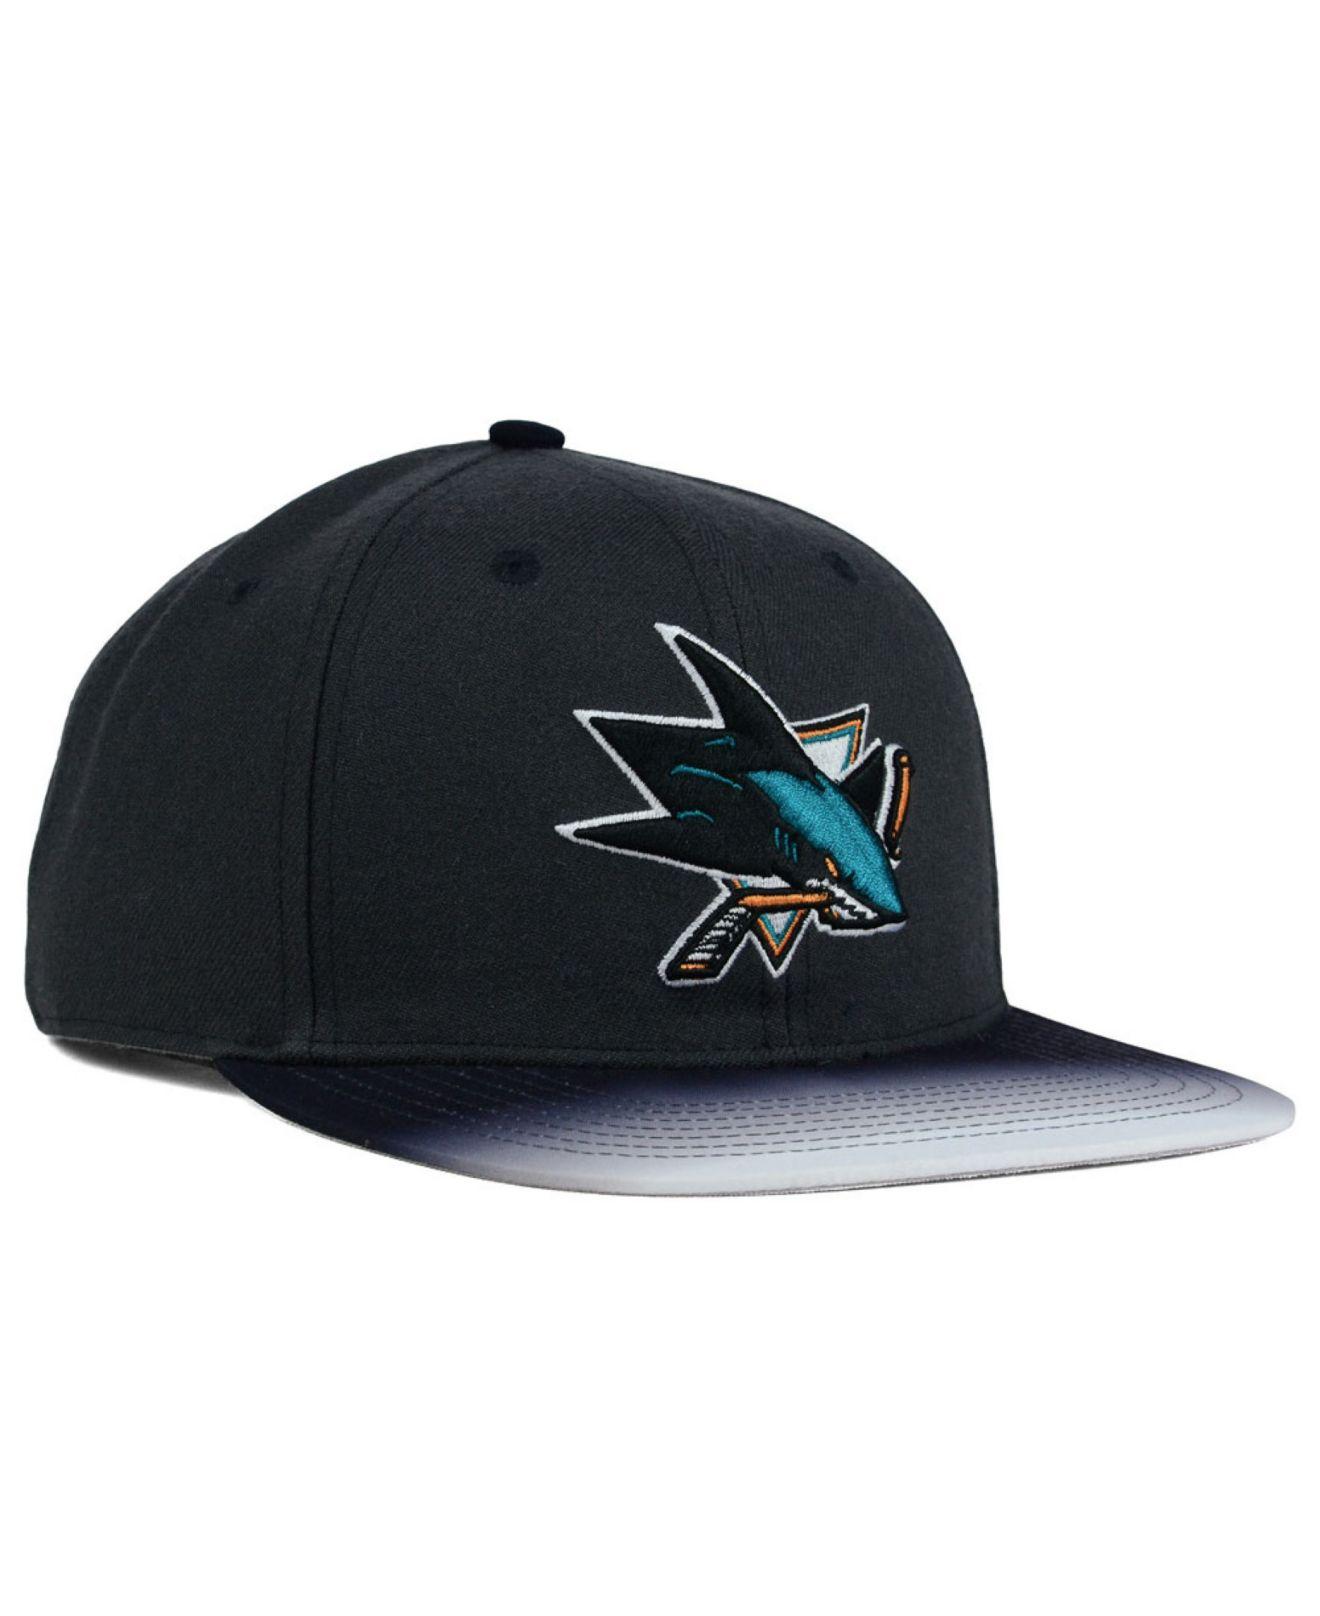 1296b7614c3f2 47 brand San Jose Sharks Dissolve Snapback Cap in Gray for Men